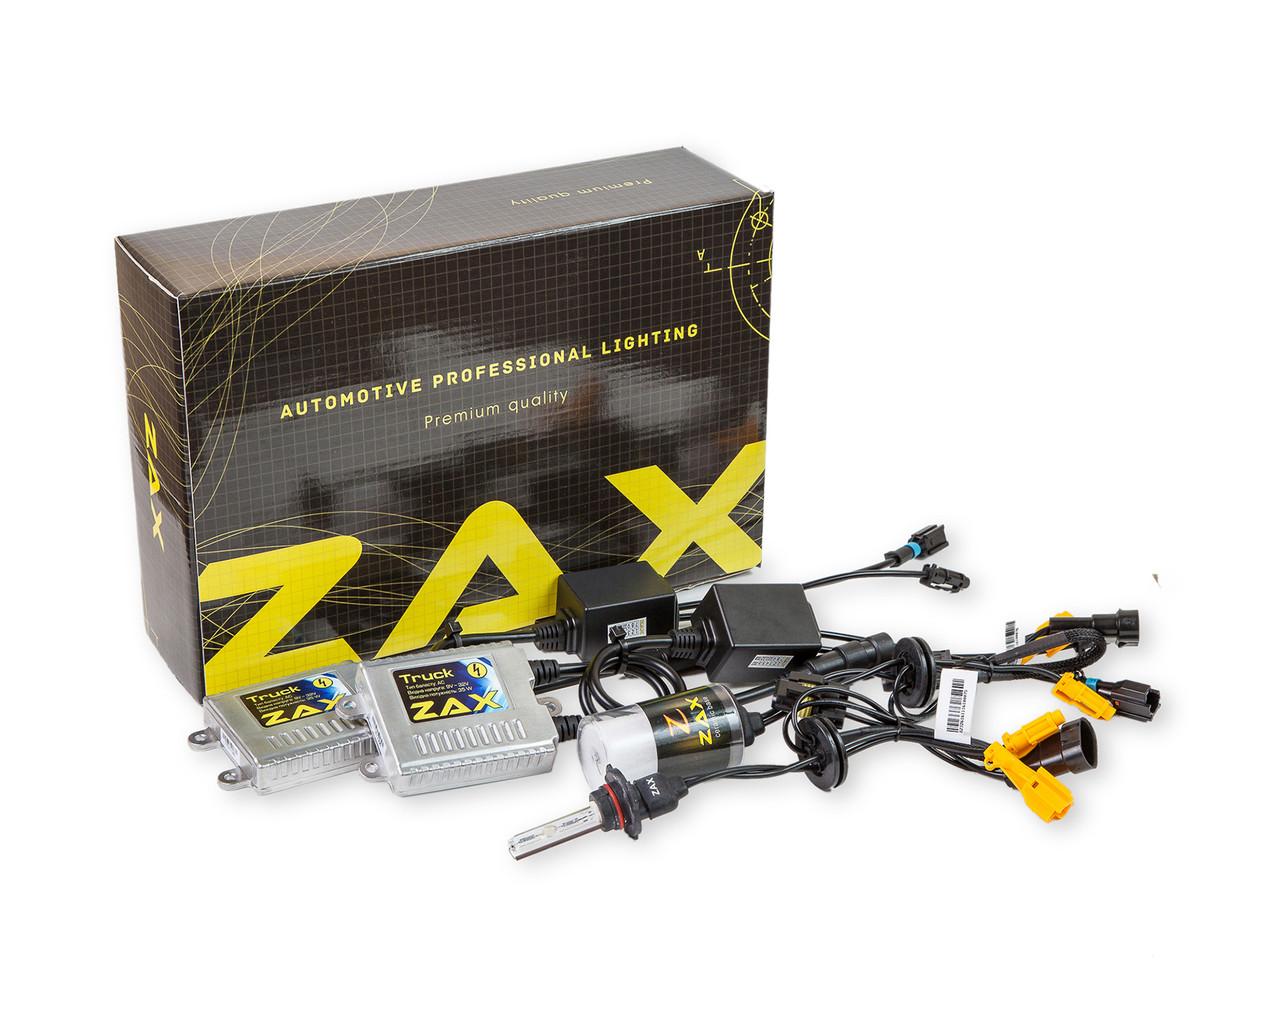 Комплект ксенона ZAX Truck 35W 9-32V HB3 (9005) Ceramic 6000K